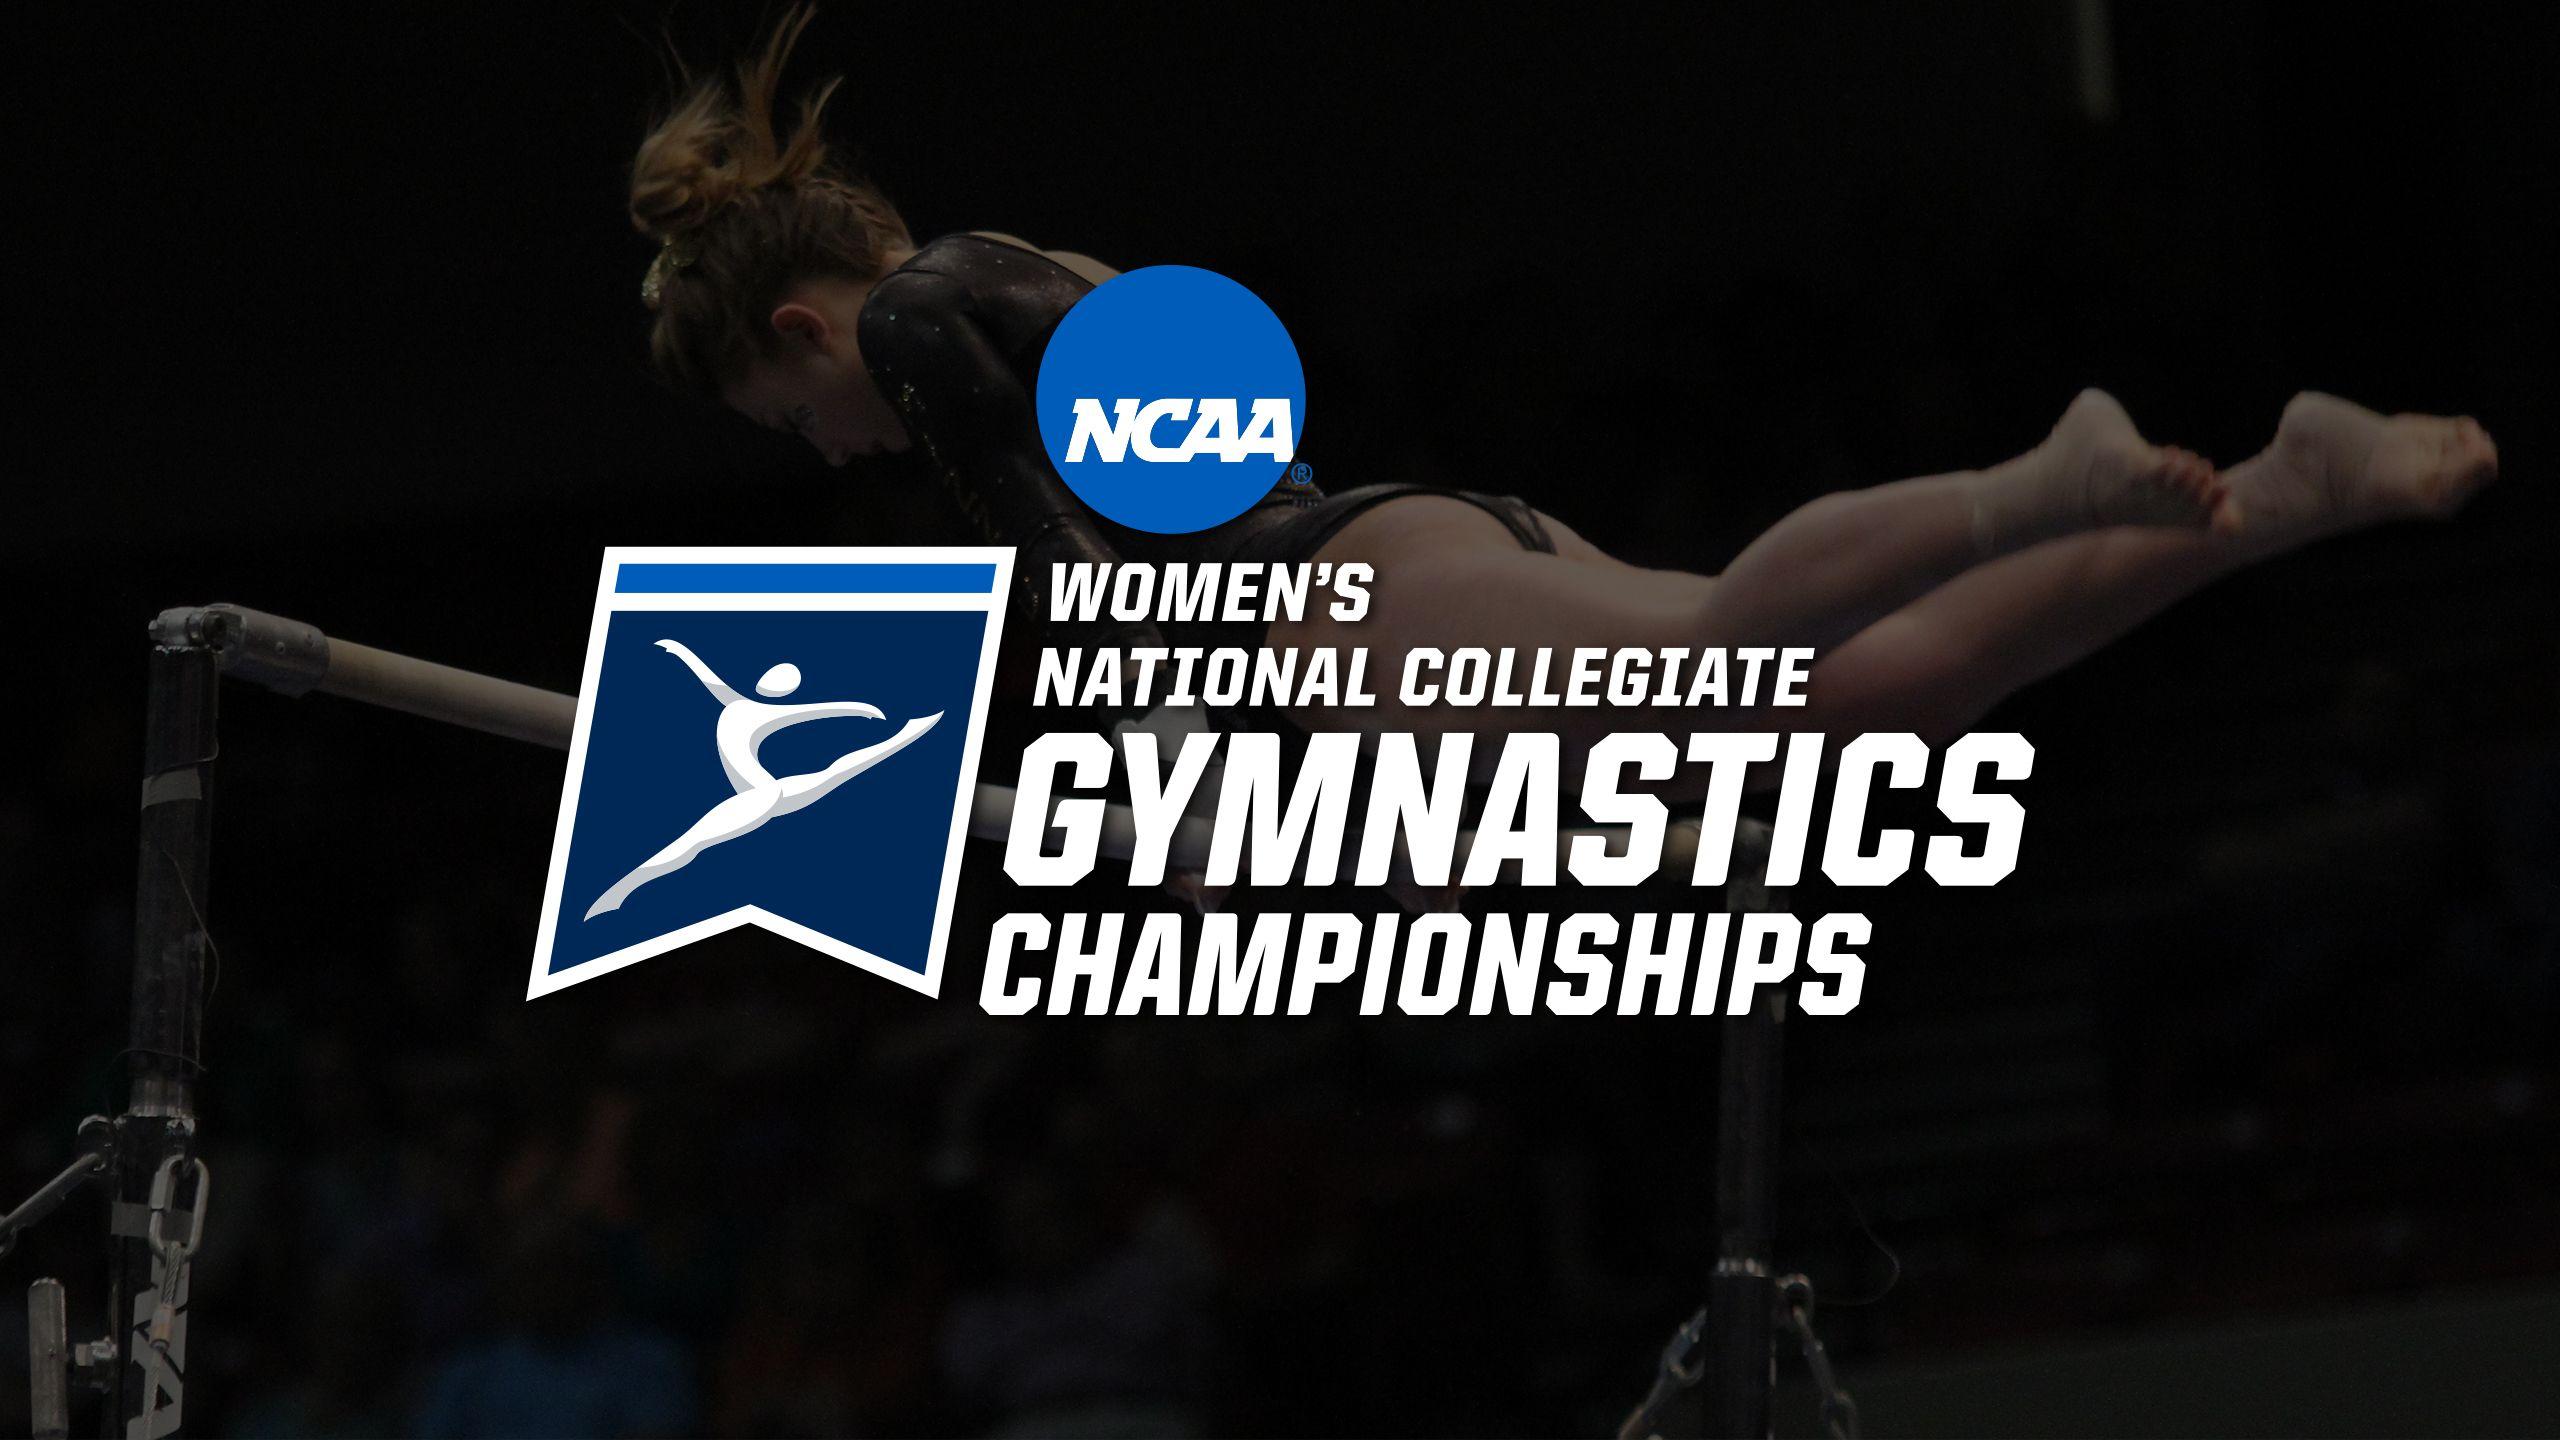 2017 NCAA Women's Gymnastics Championships Presented by Northwestern Mutual (Super Six Team Finals)